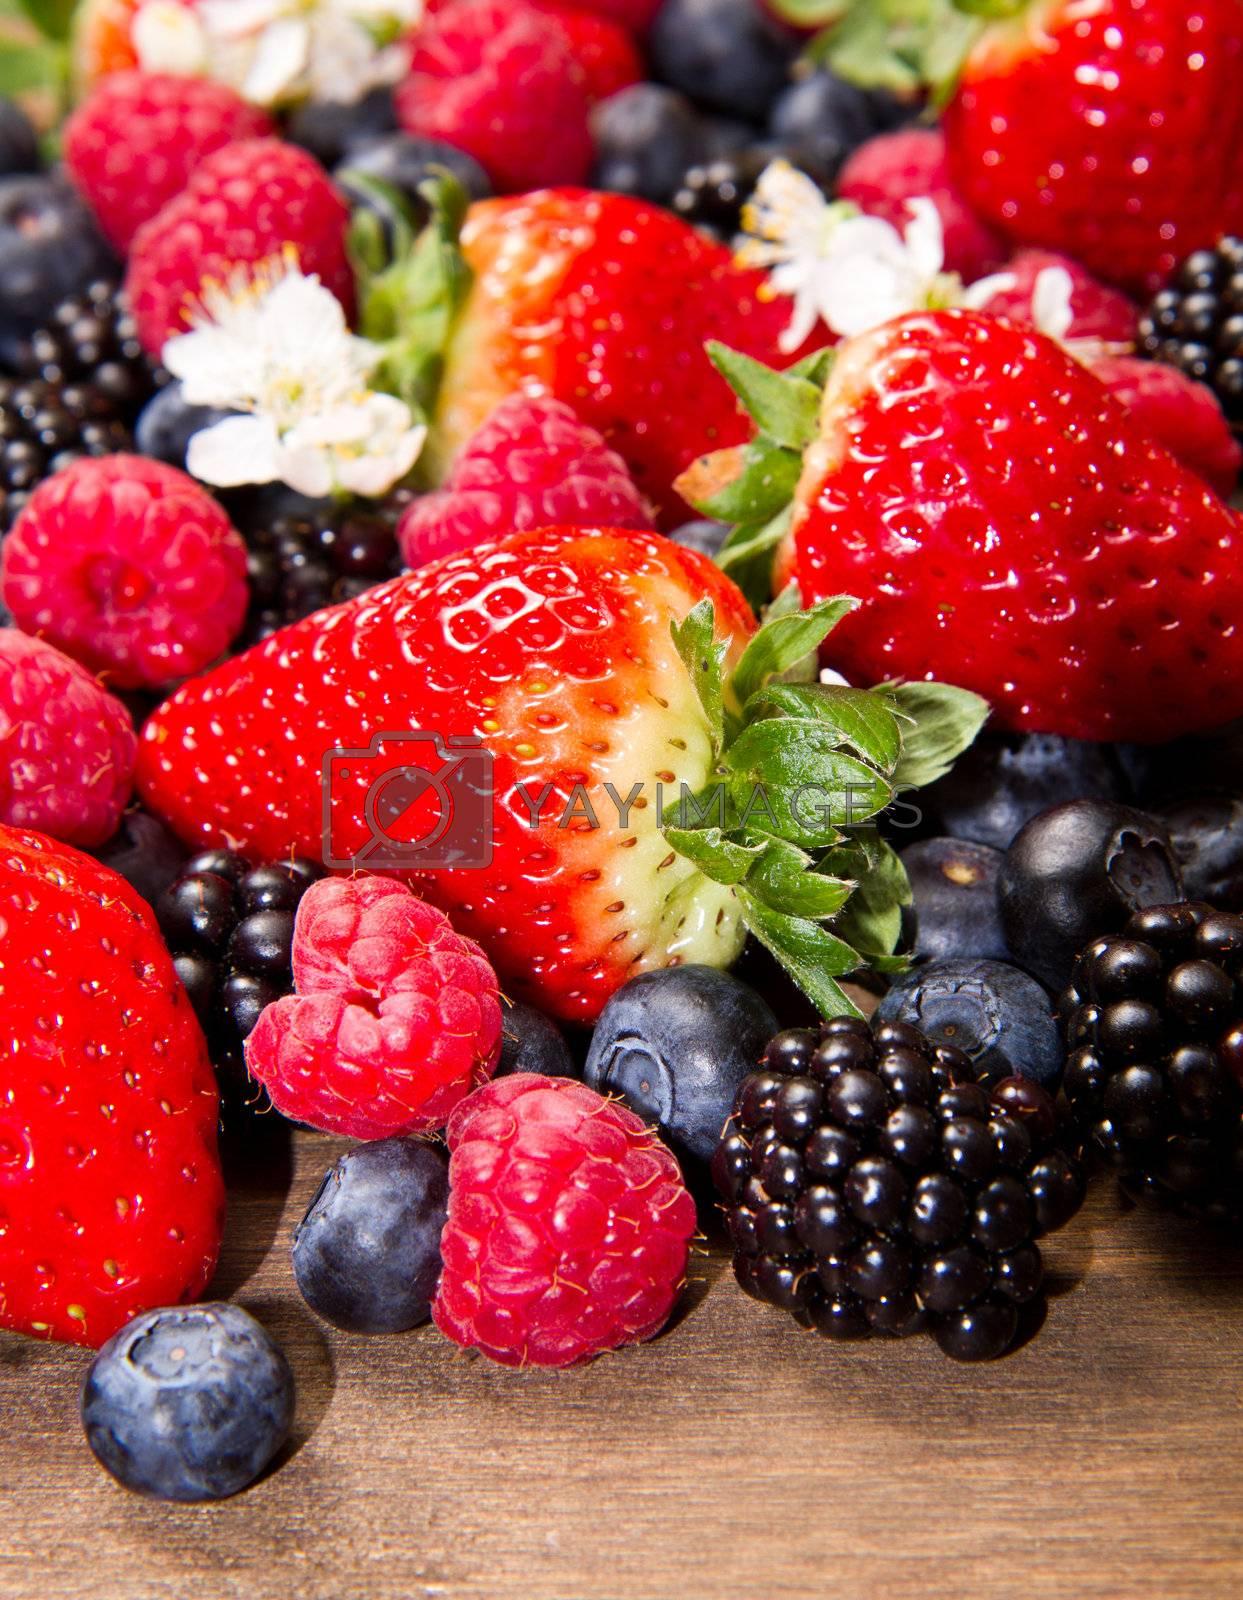 Berry over Wood. Strawberries, Raspberries, Blueberry